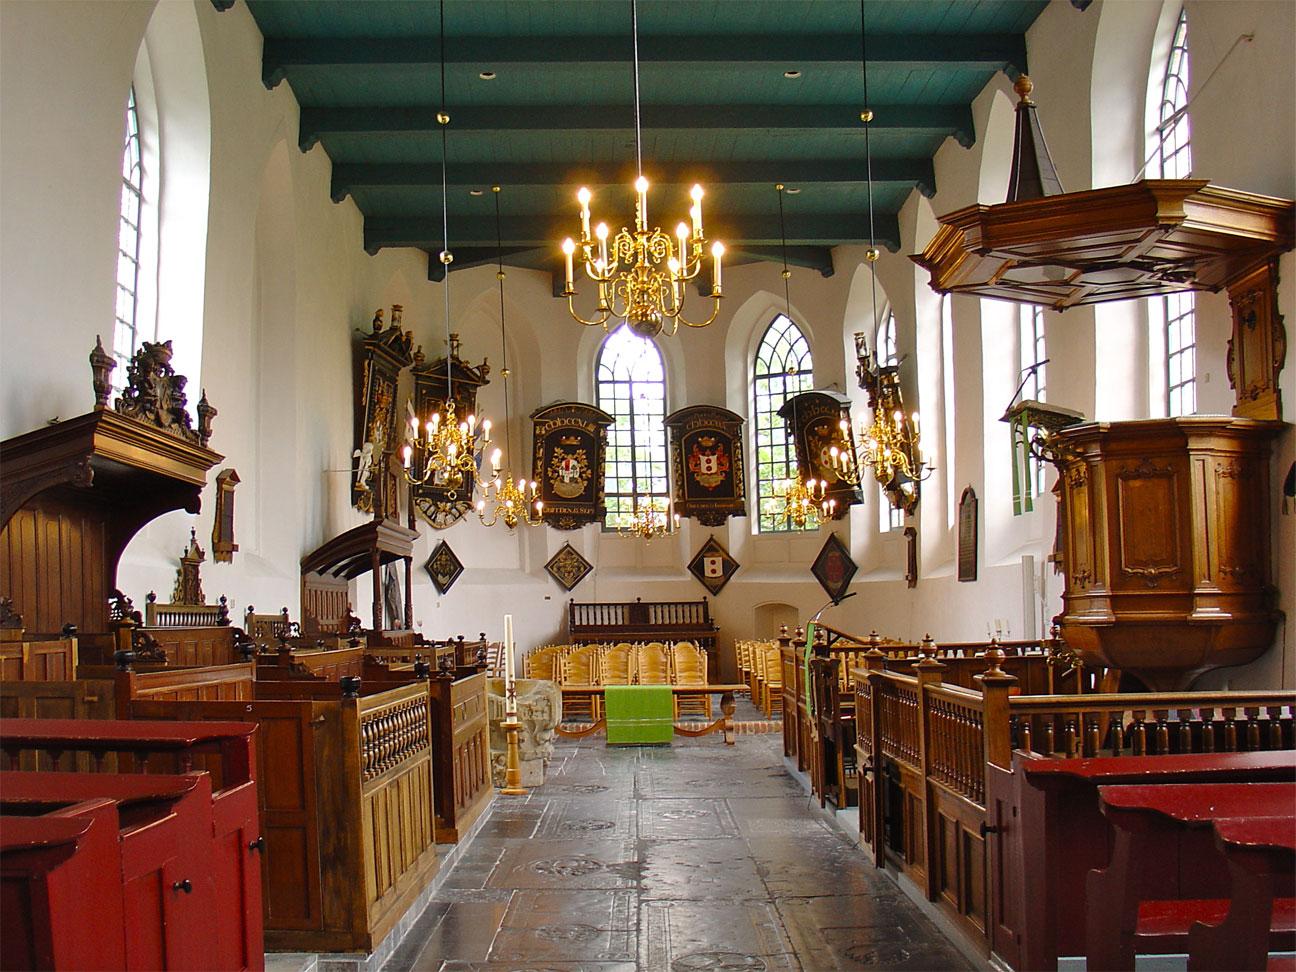 https://upload.wikimedia.org/wikipedia/commons/4/43/Kerk_Buitenpost_interieur.jpg